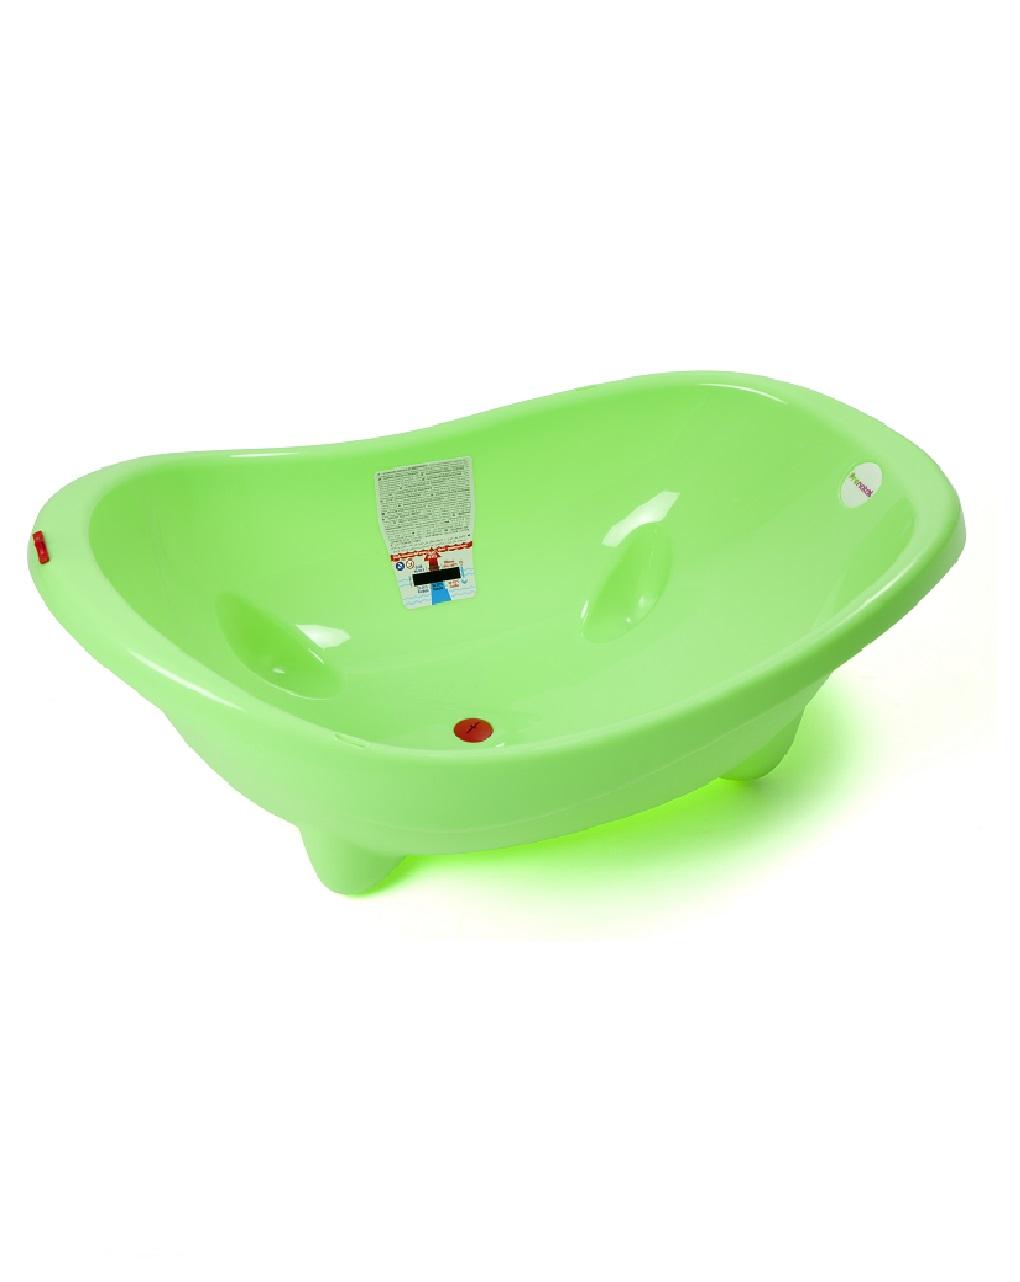 Giordani Μπανάκι Soap Bubble Πράσινο